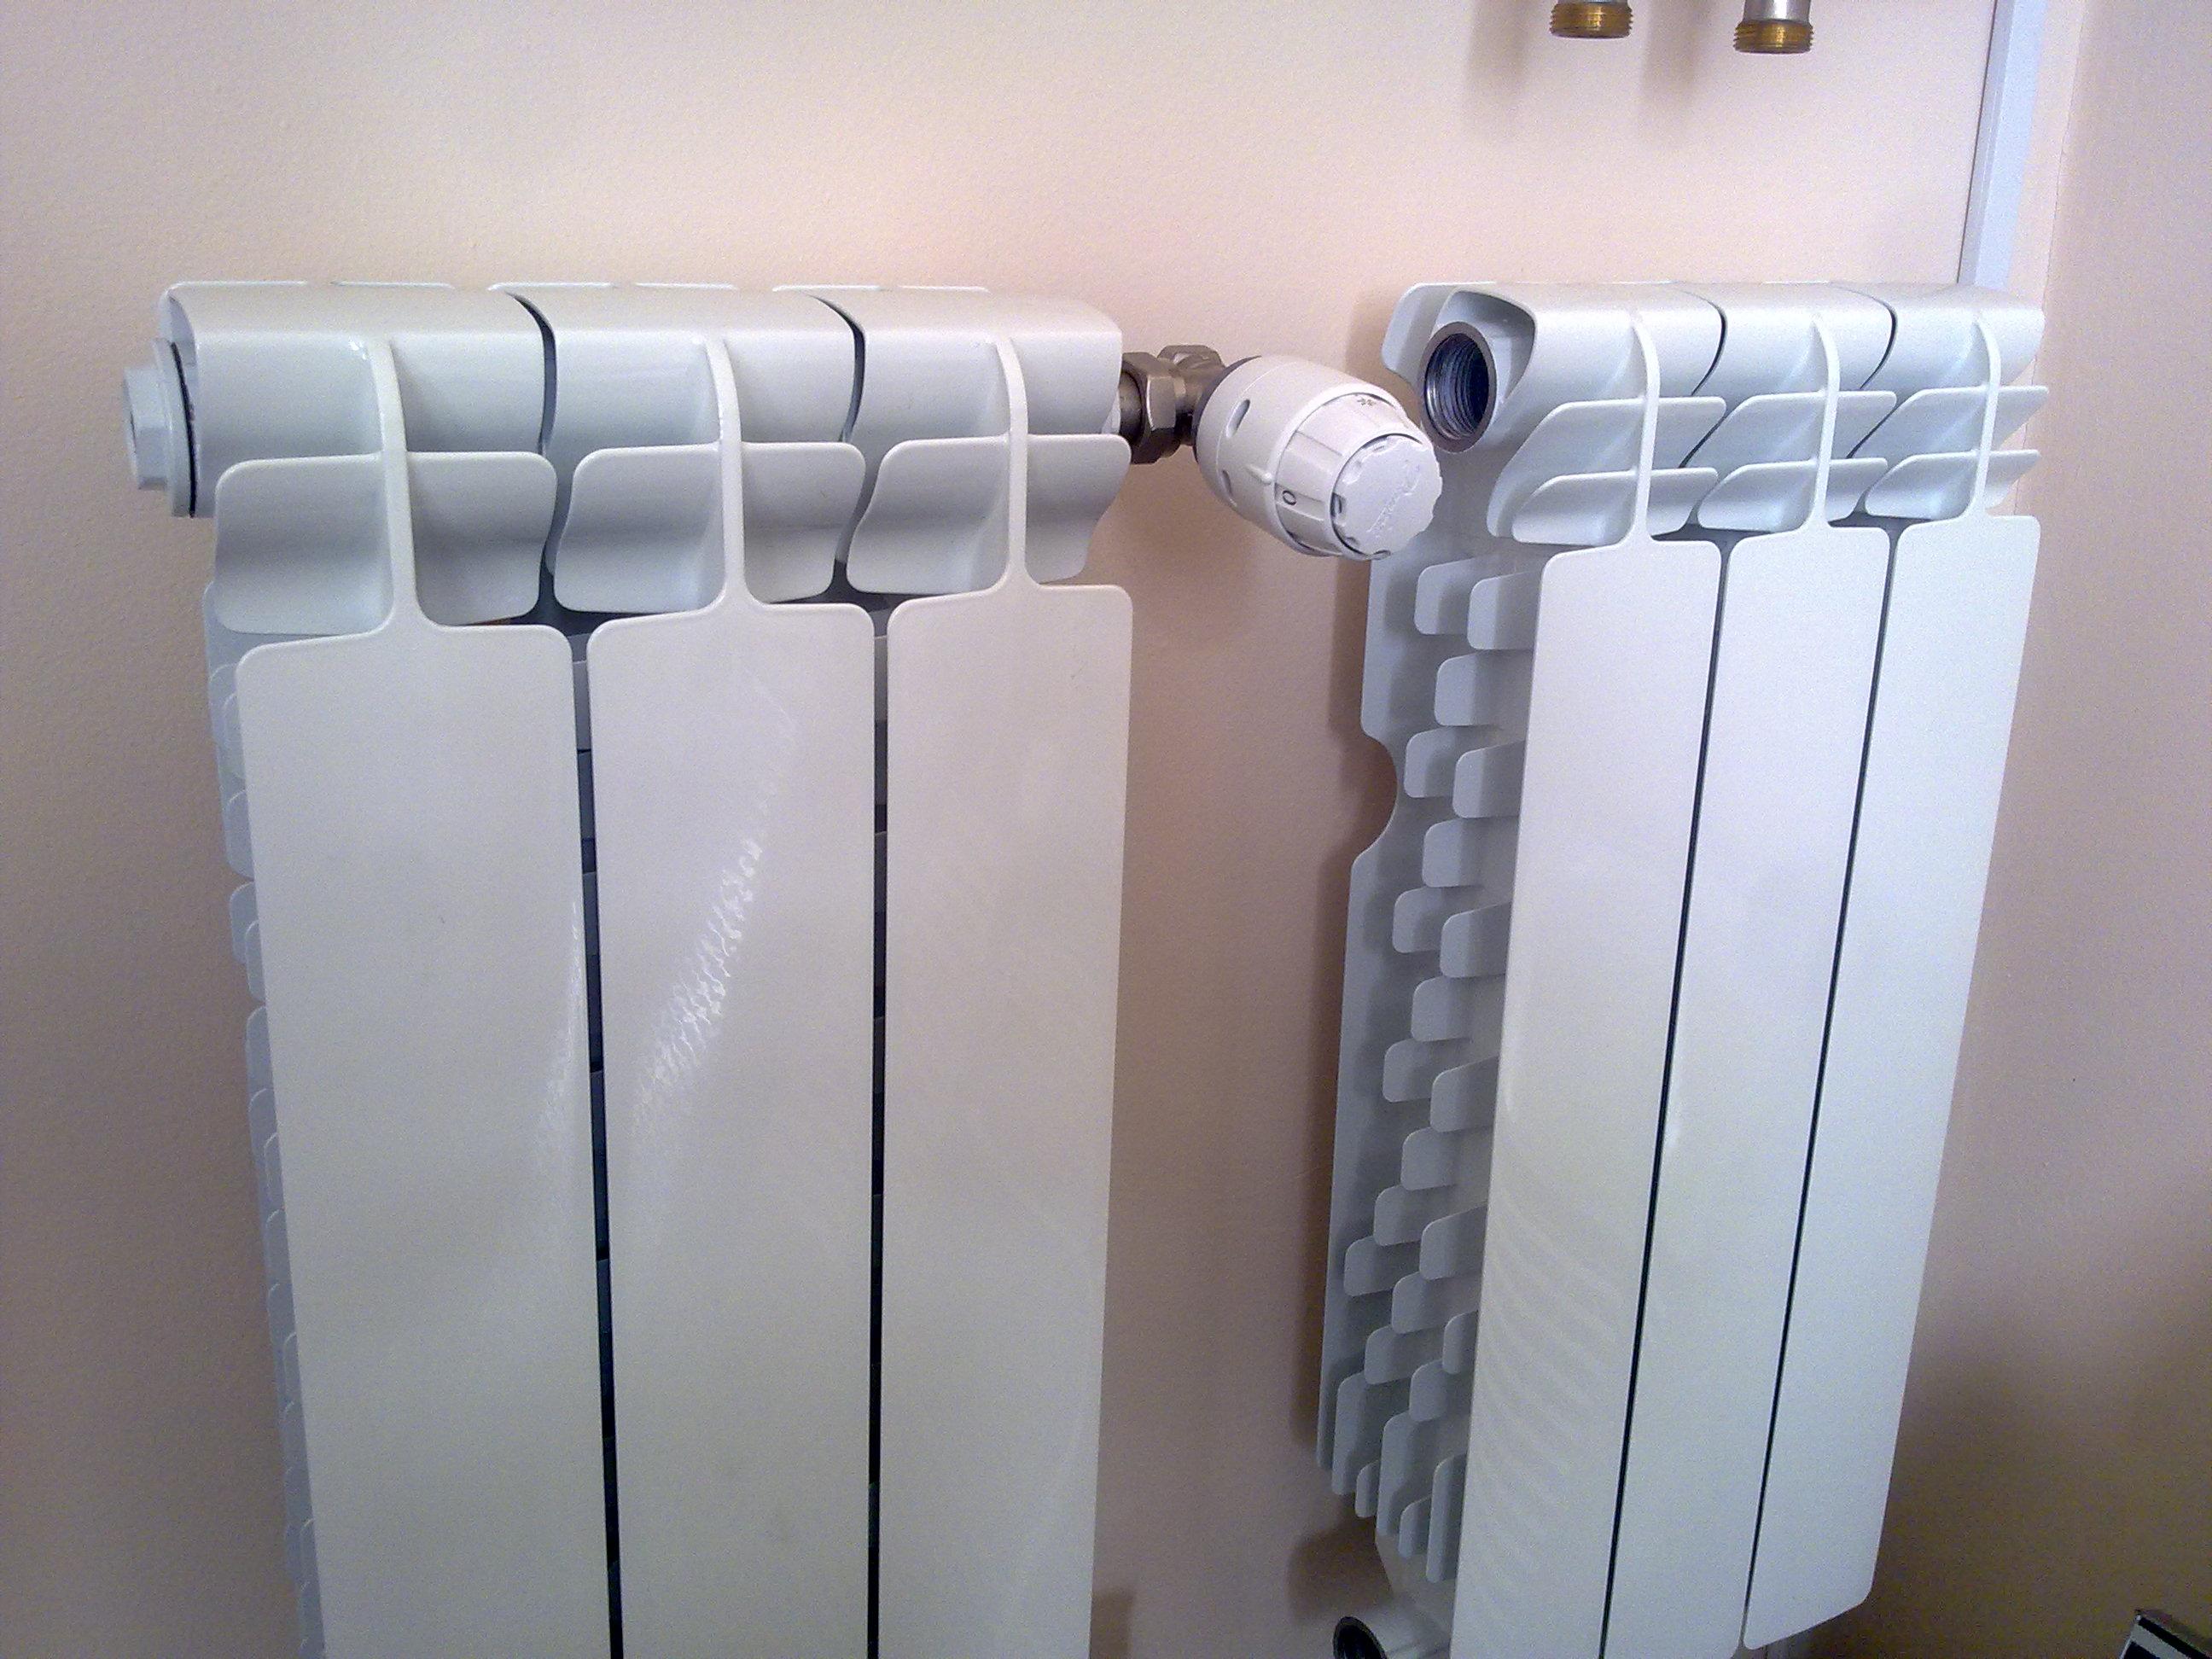 chauffage solaire de piscine el nino devis contact artisan merignac levallois perret issy. Black Bedroom Furniture Sets. Home Design Ideas